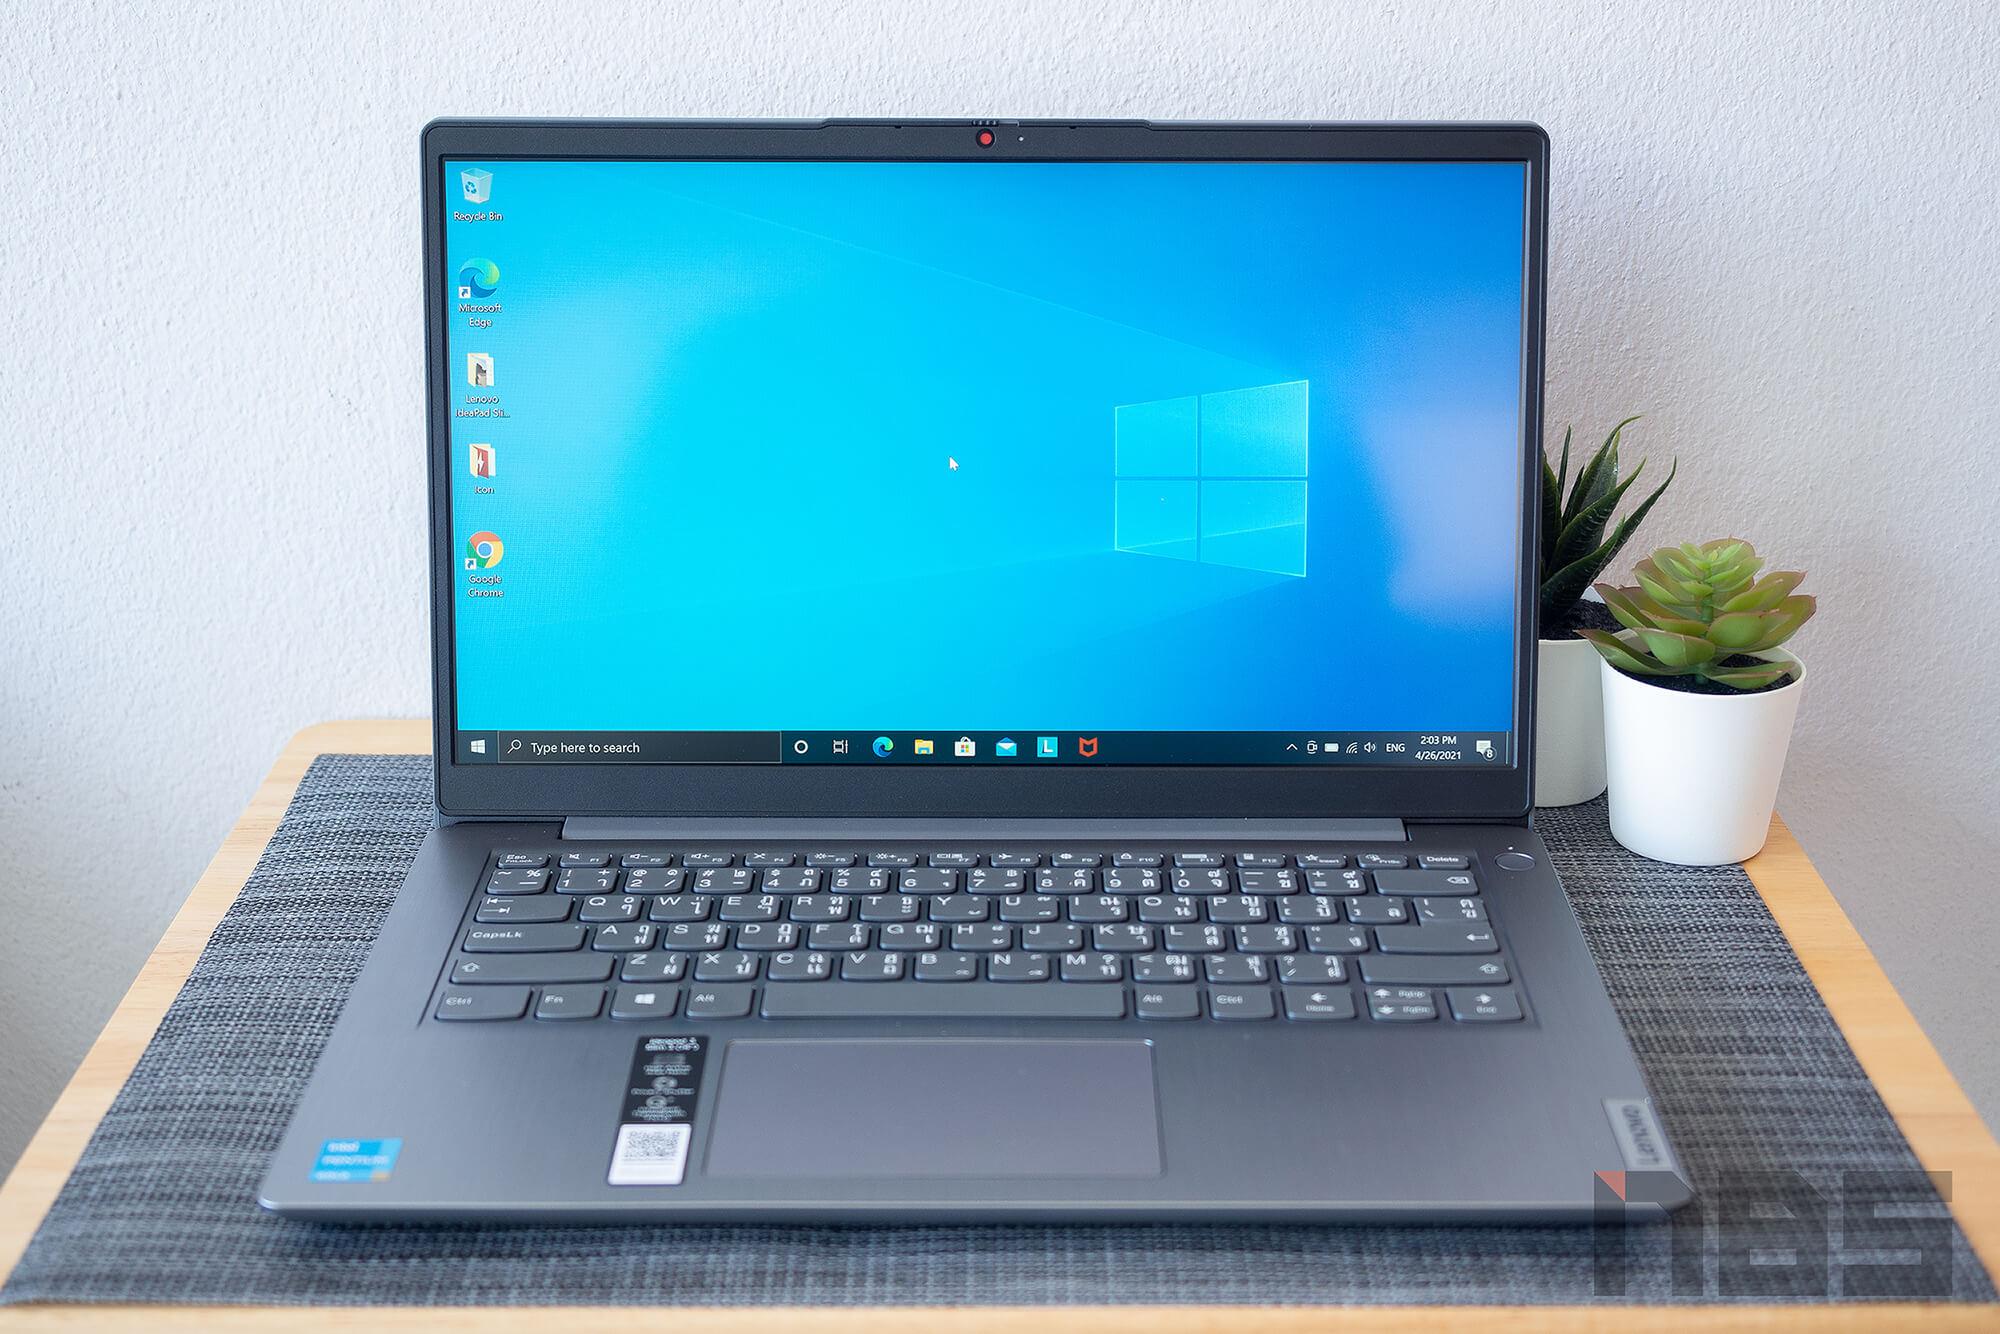 Review Lenovo IdeaPad Slim 3i pentium NotebookSPEC 22